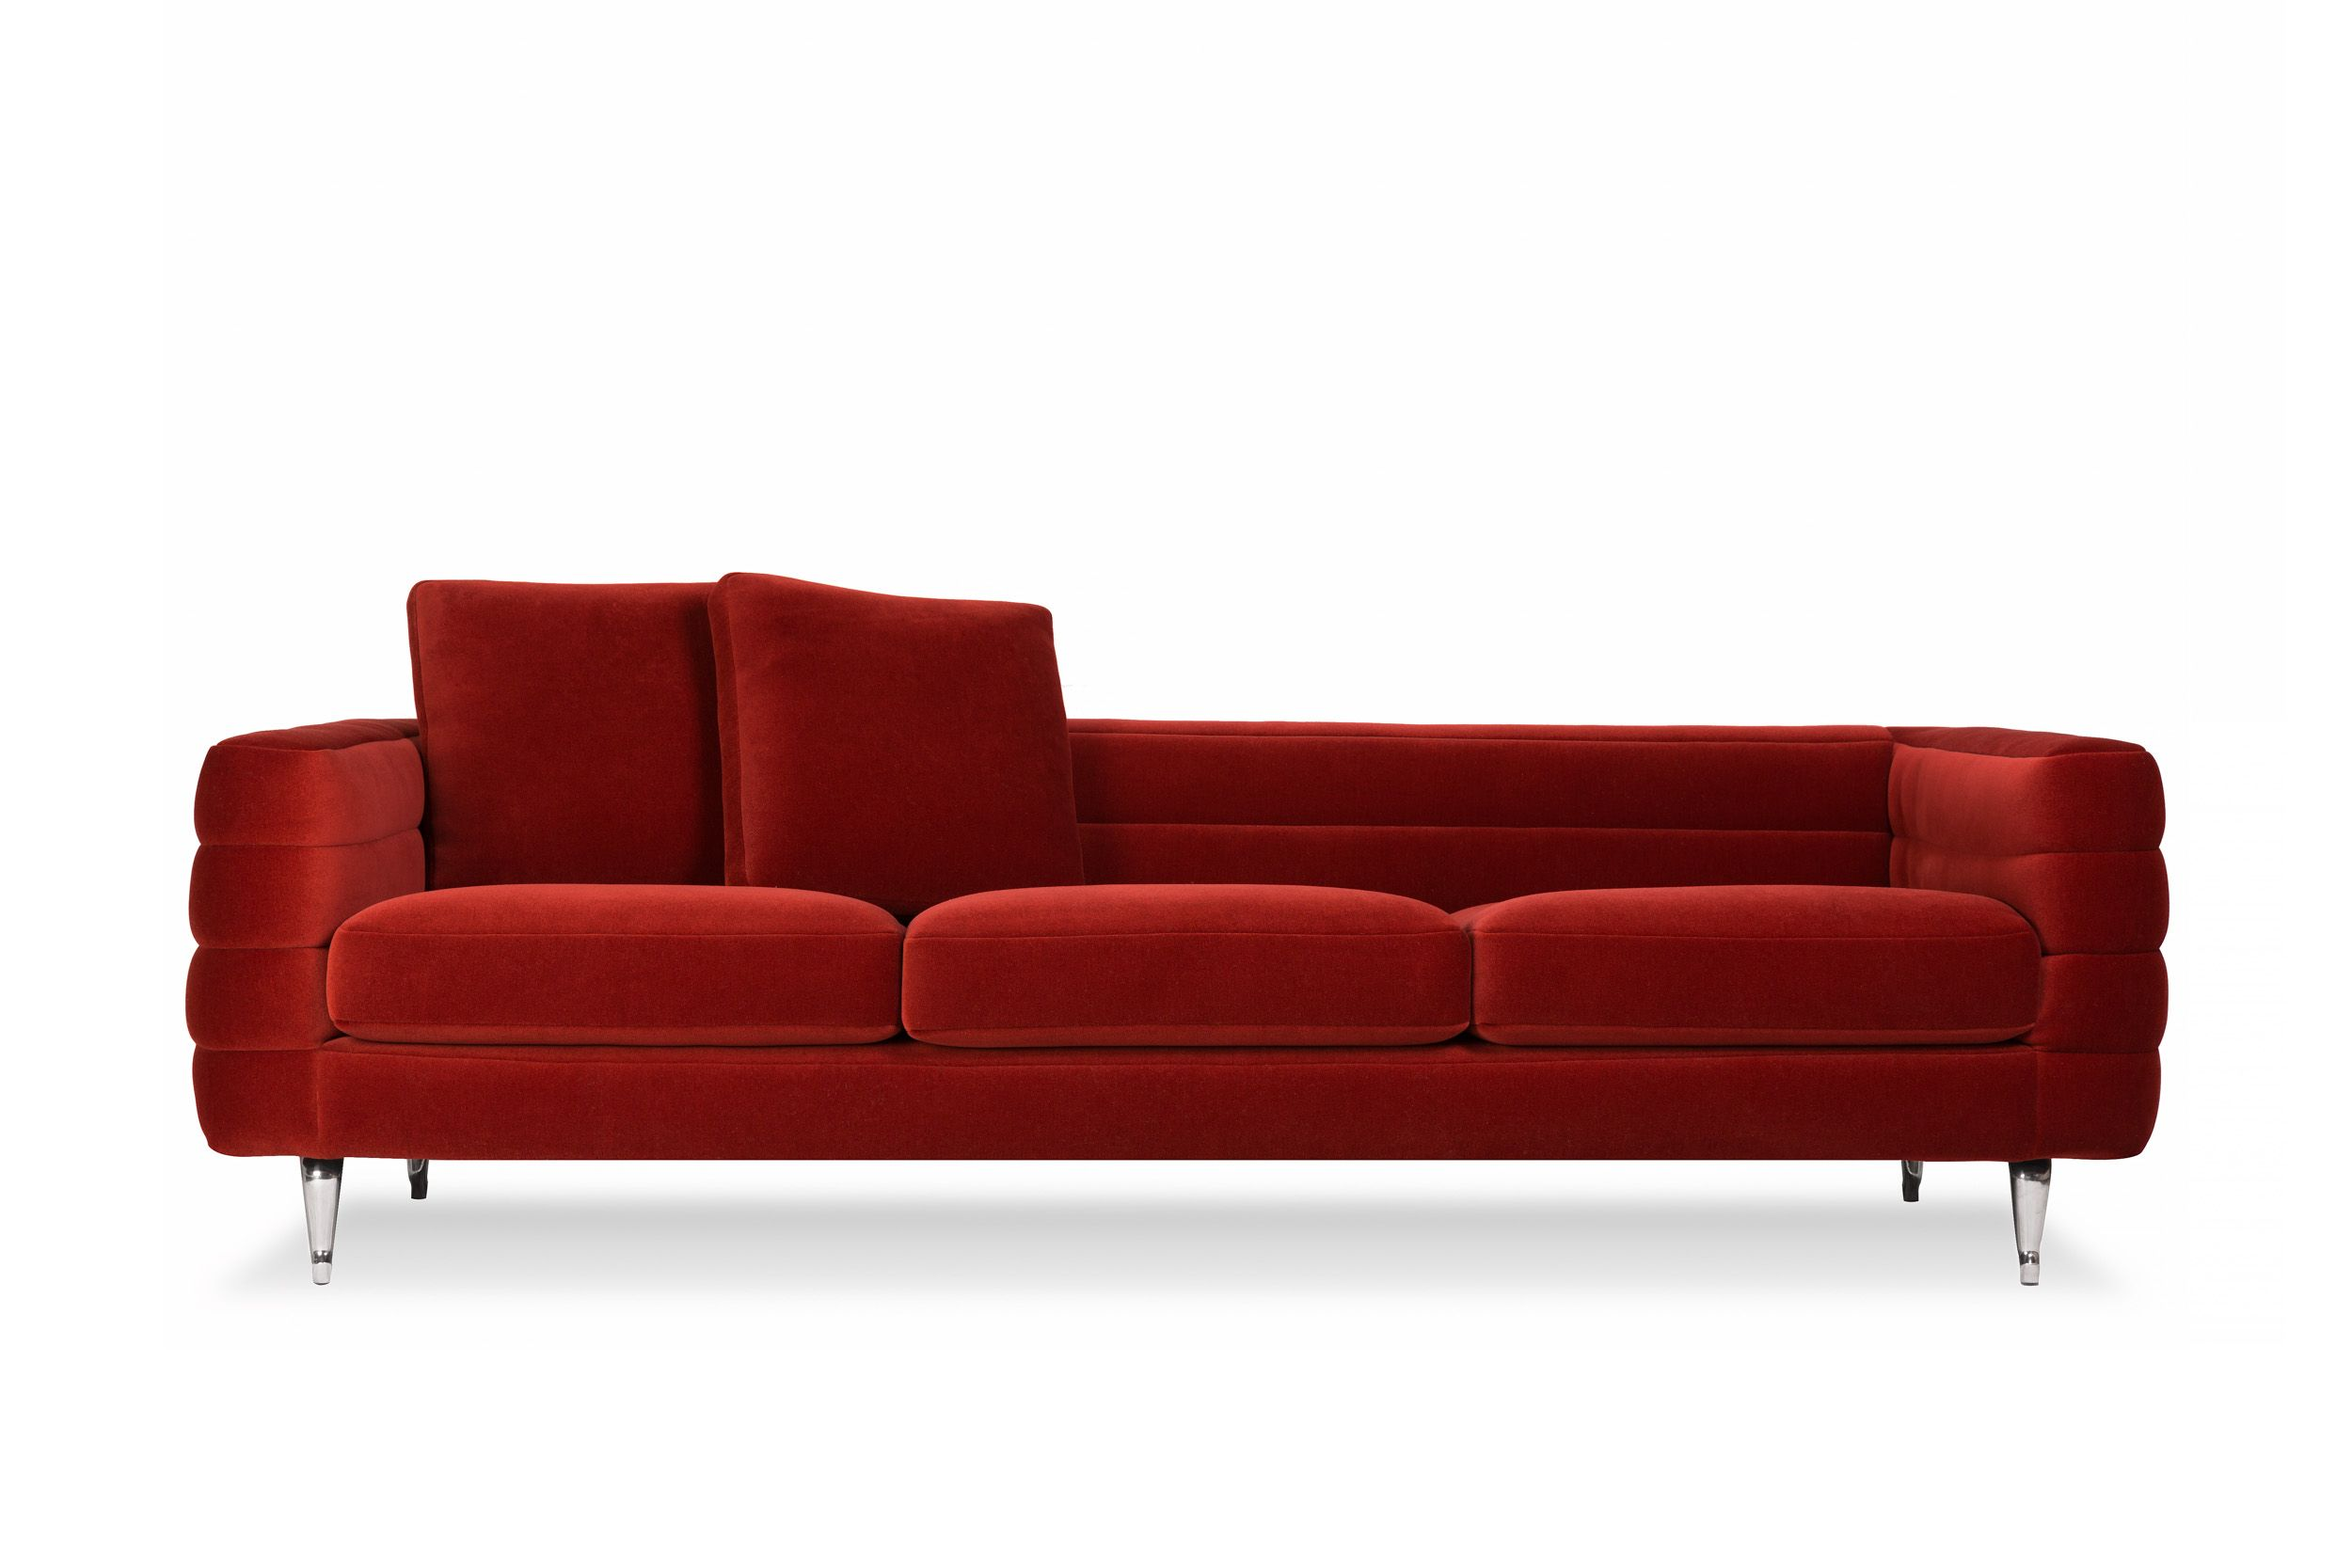 boutique_botero_triple_seater_cushions.jpg